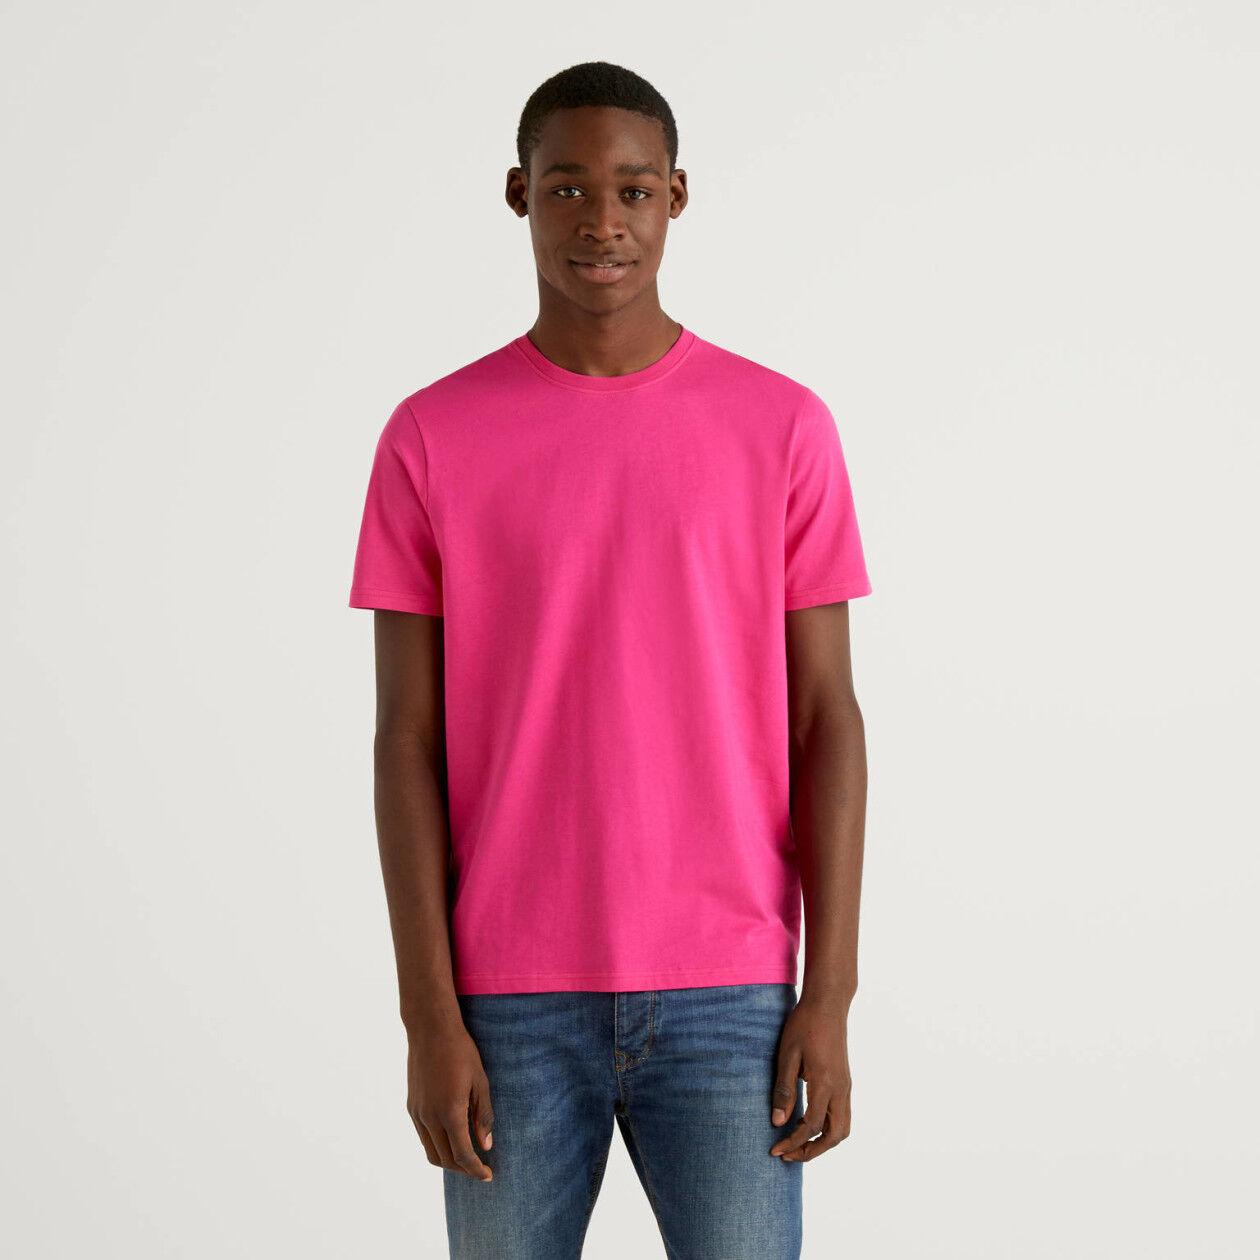 Fuchsia t-shirt in pure cotton